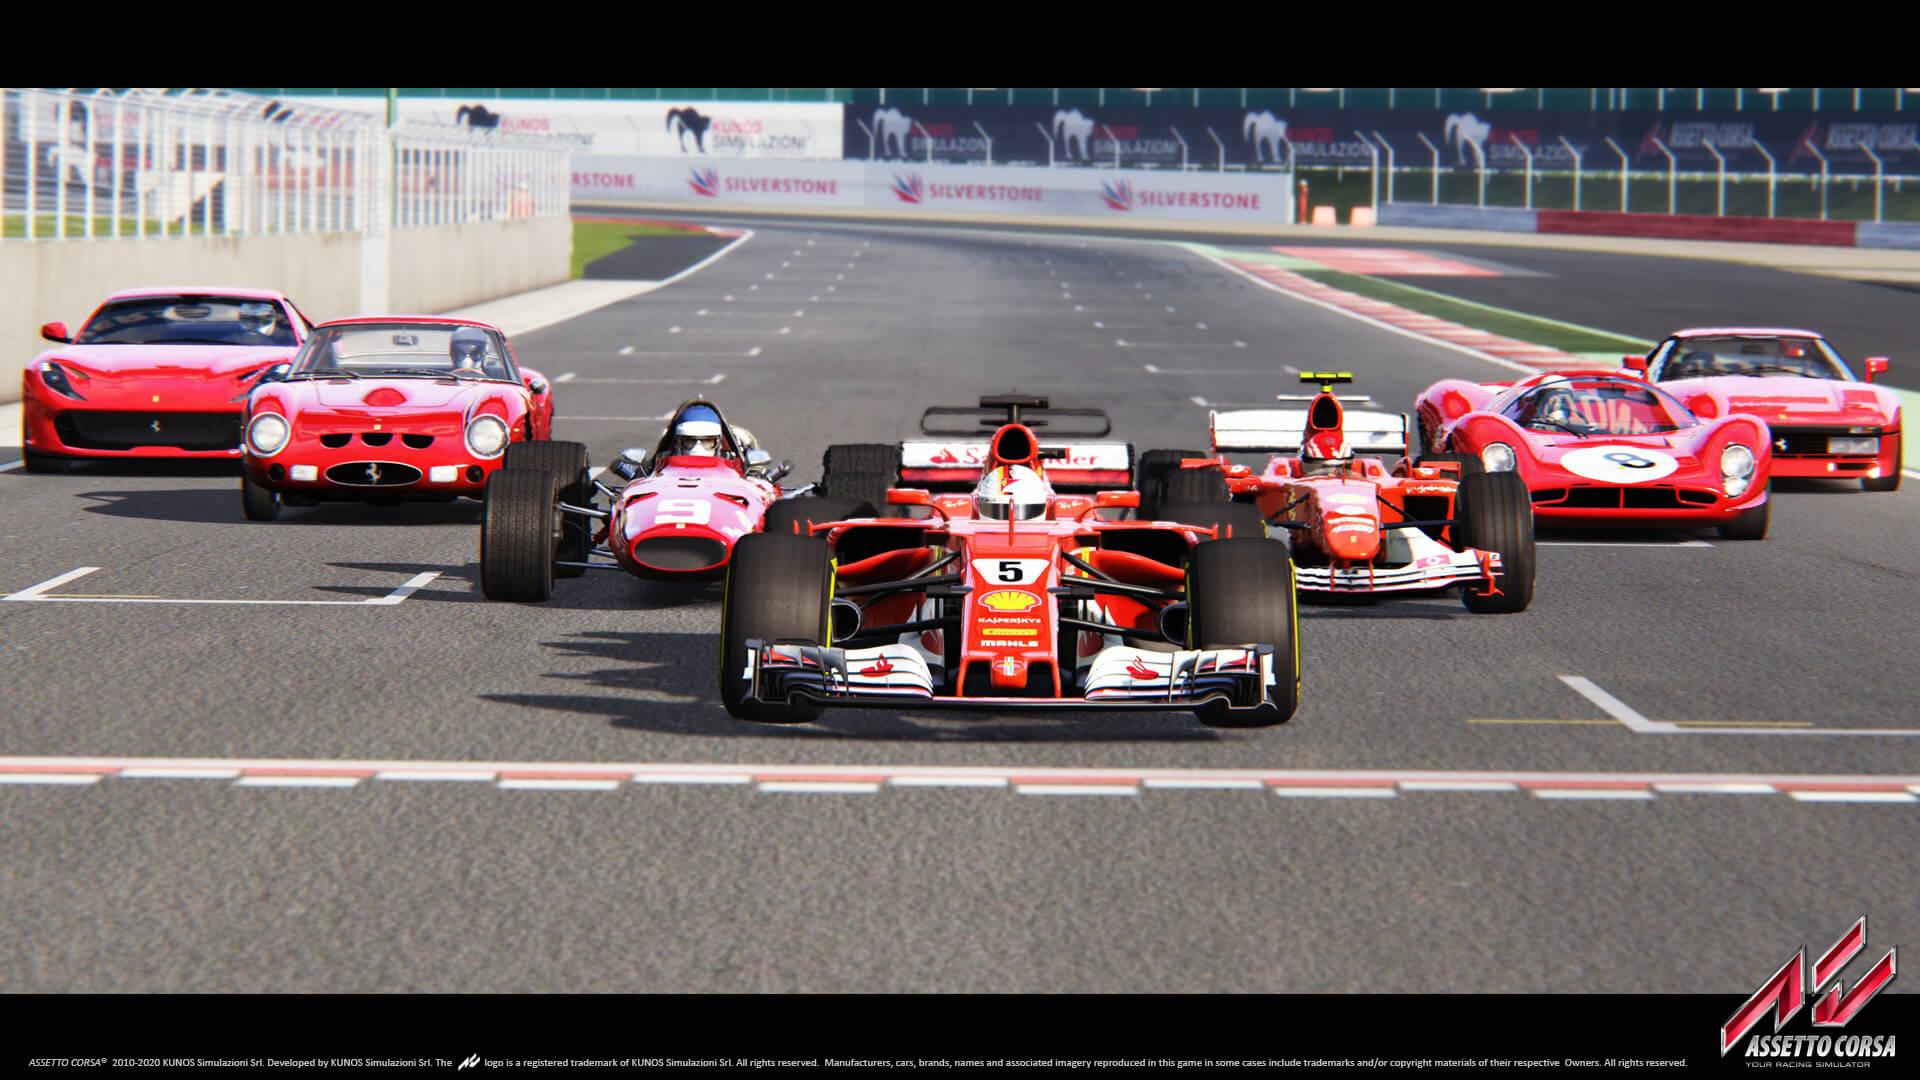 Latest Assetto Corsa Dlc Trailer Shows The Ferrari Sf70h